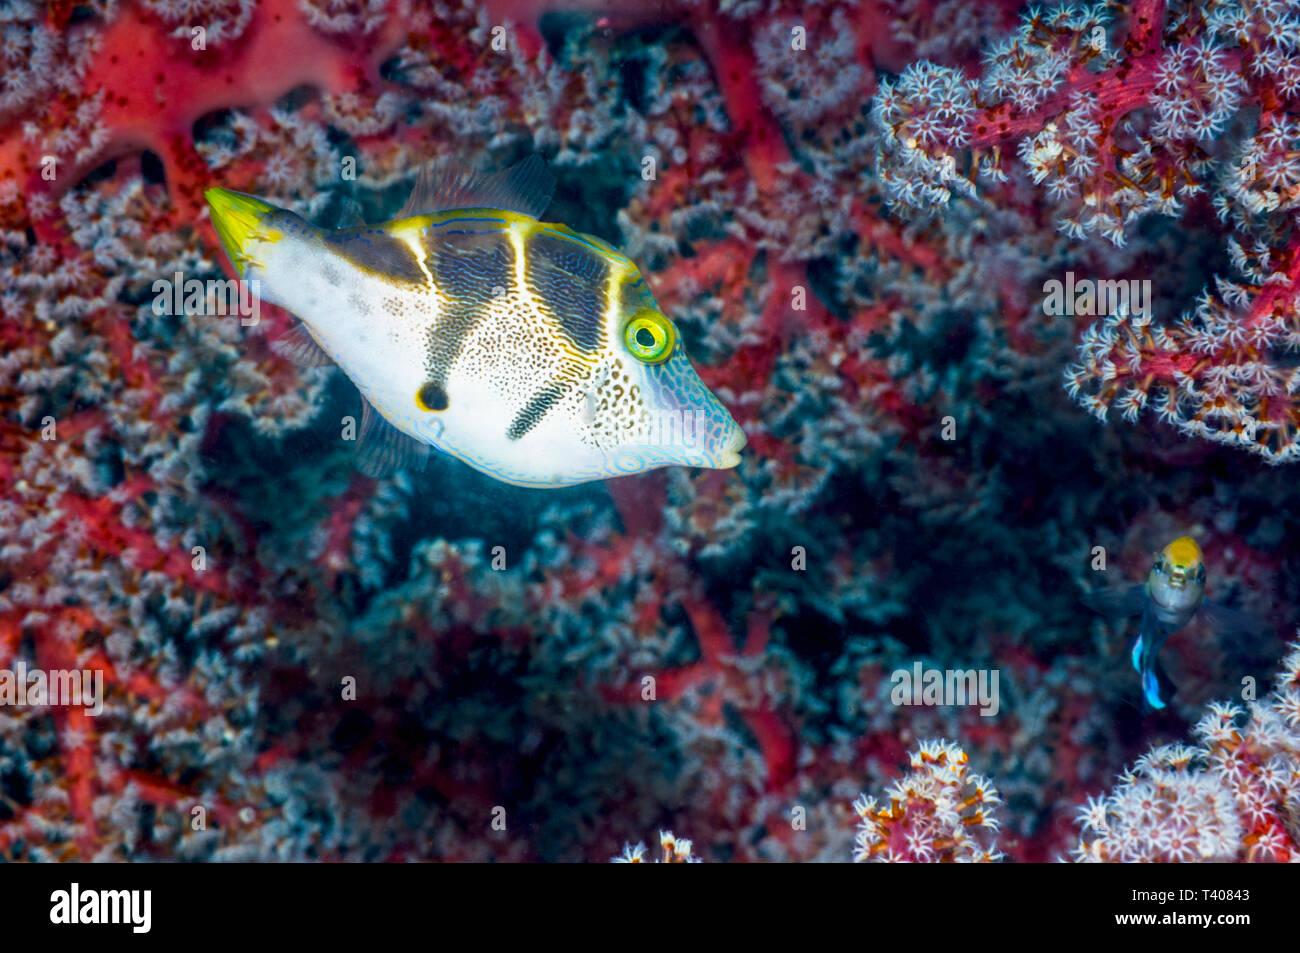 Filefish Paraluteres prionurus] [nachahmen. Komodo National Park, Indonesia. Stockbild